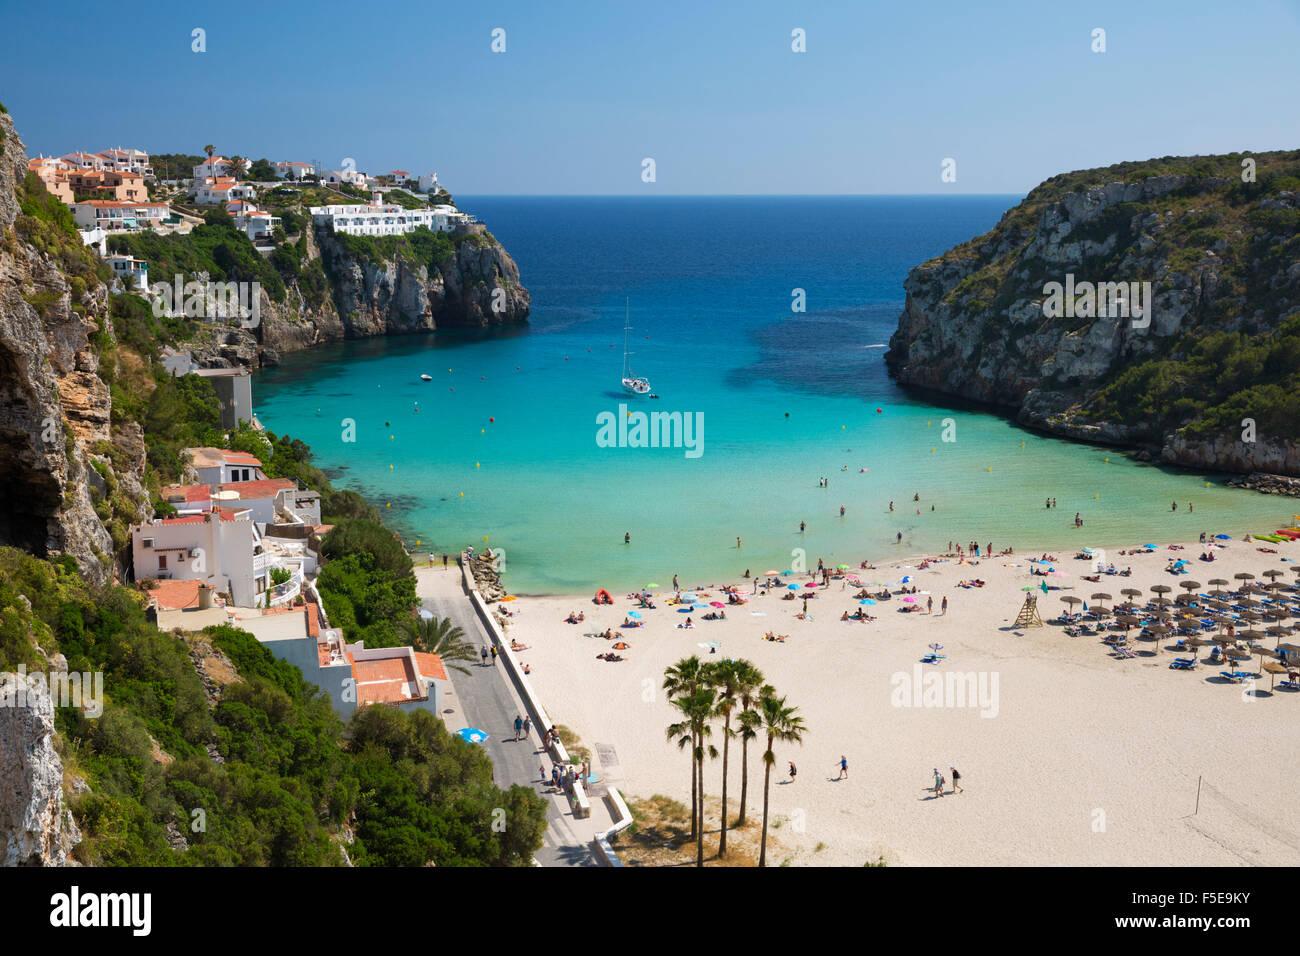 View over beach, Cala en Porter, south east Coast, Menorca, Balearic Islands, Spain, Mediteranean, Europe - Stock Image